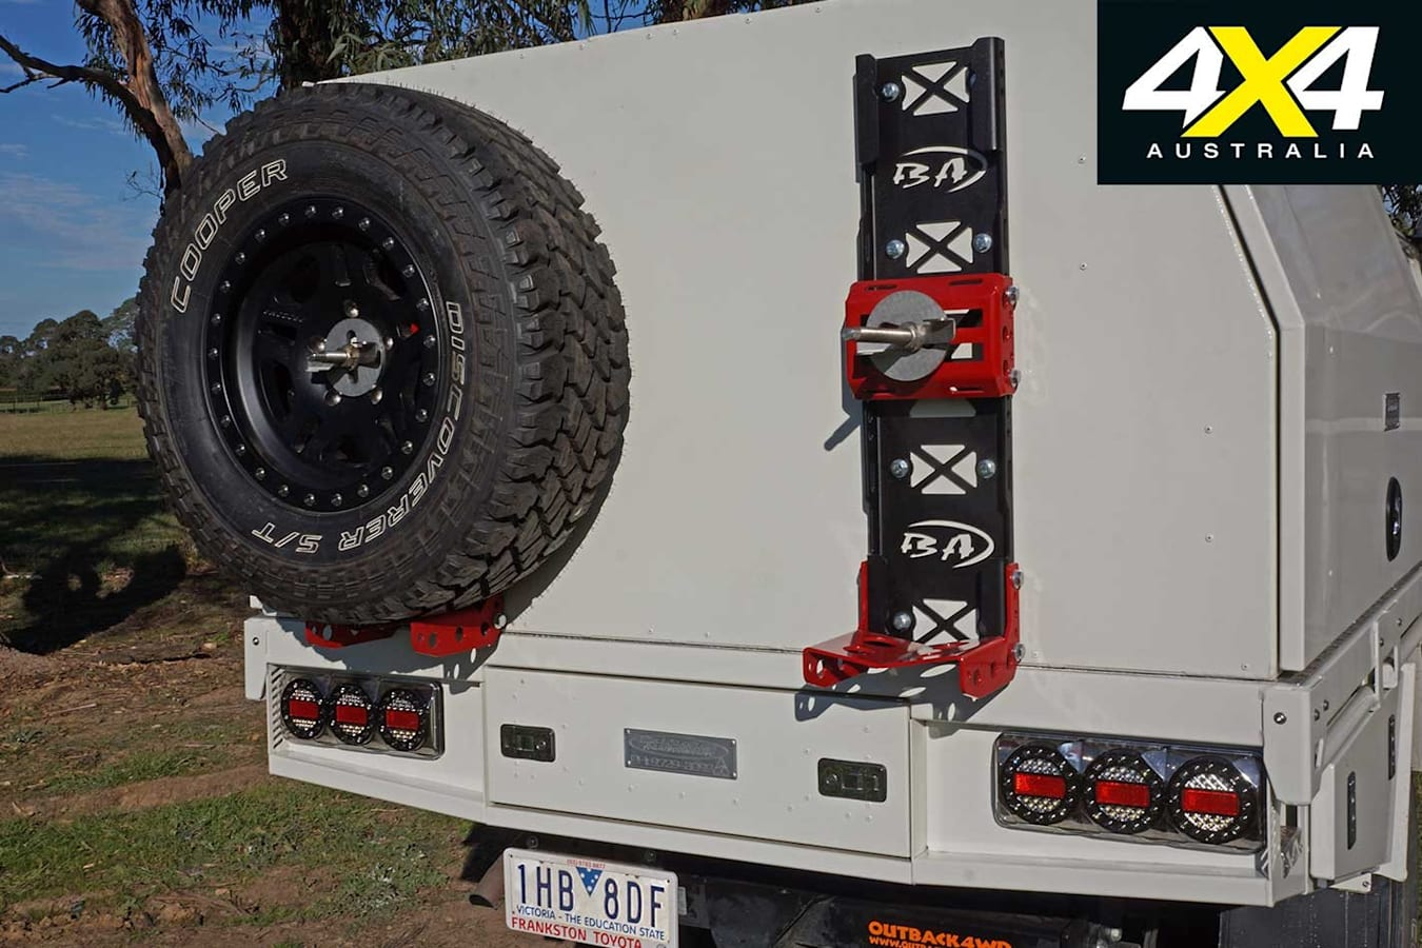 4 X 4 Shed Toyota Land Cruiser 79 Series Spare Wheel Holders Jpg